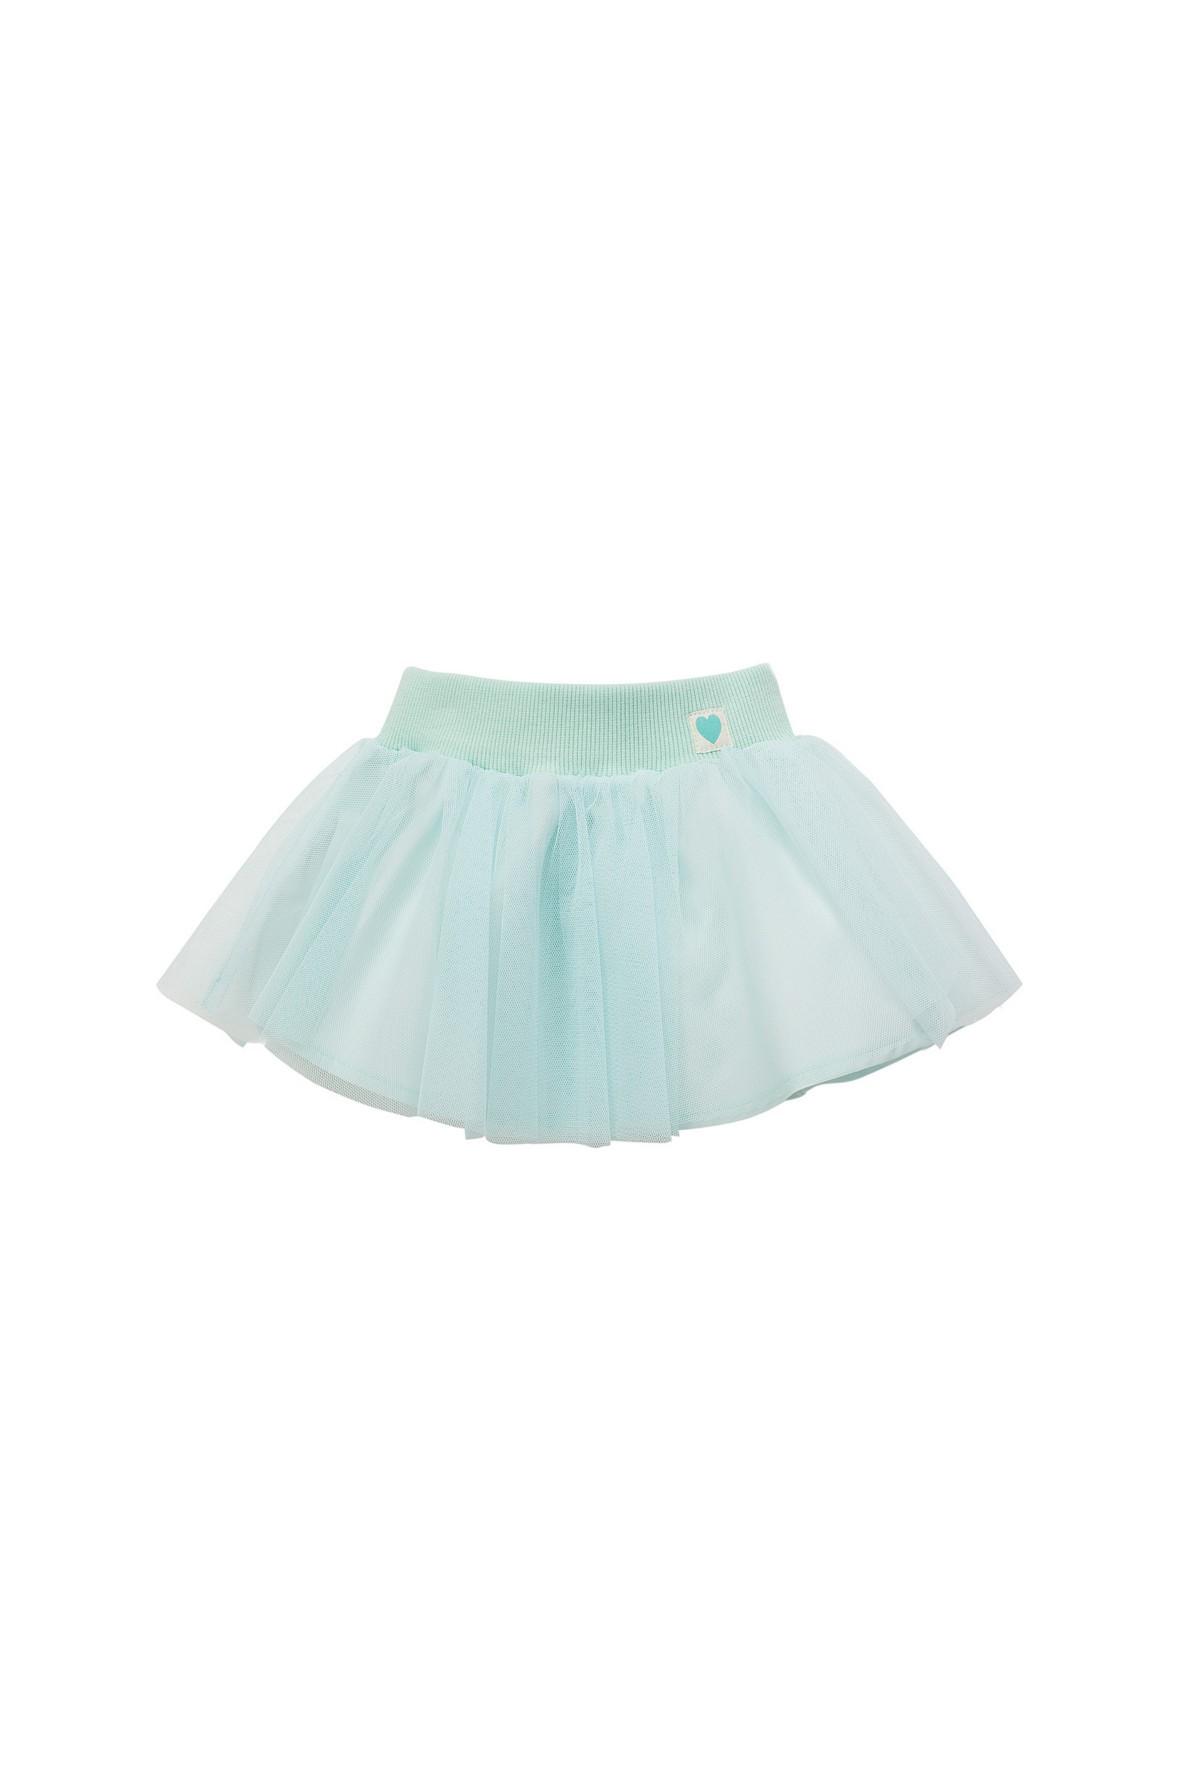 Spódnica tiulowa niebieska